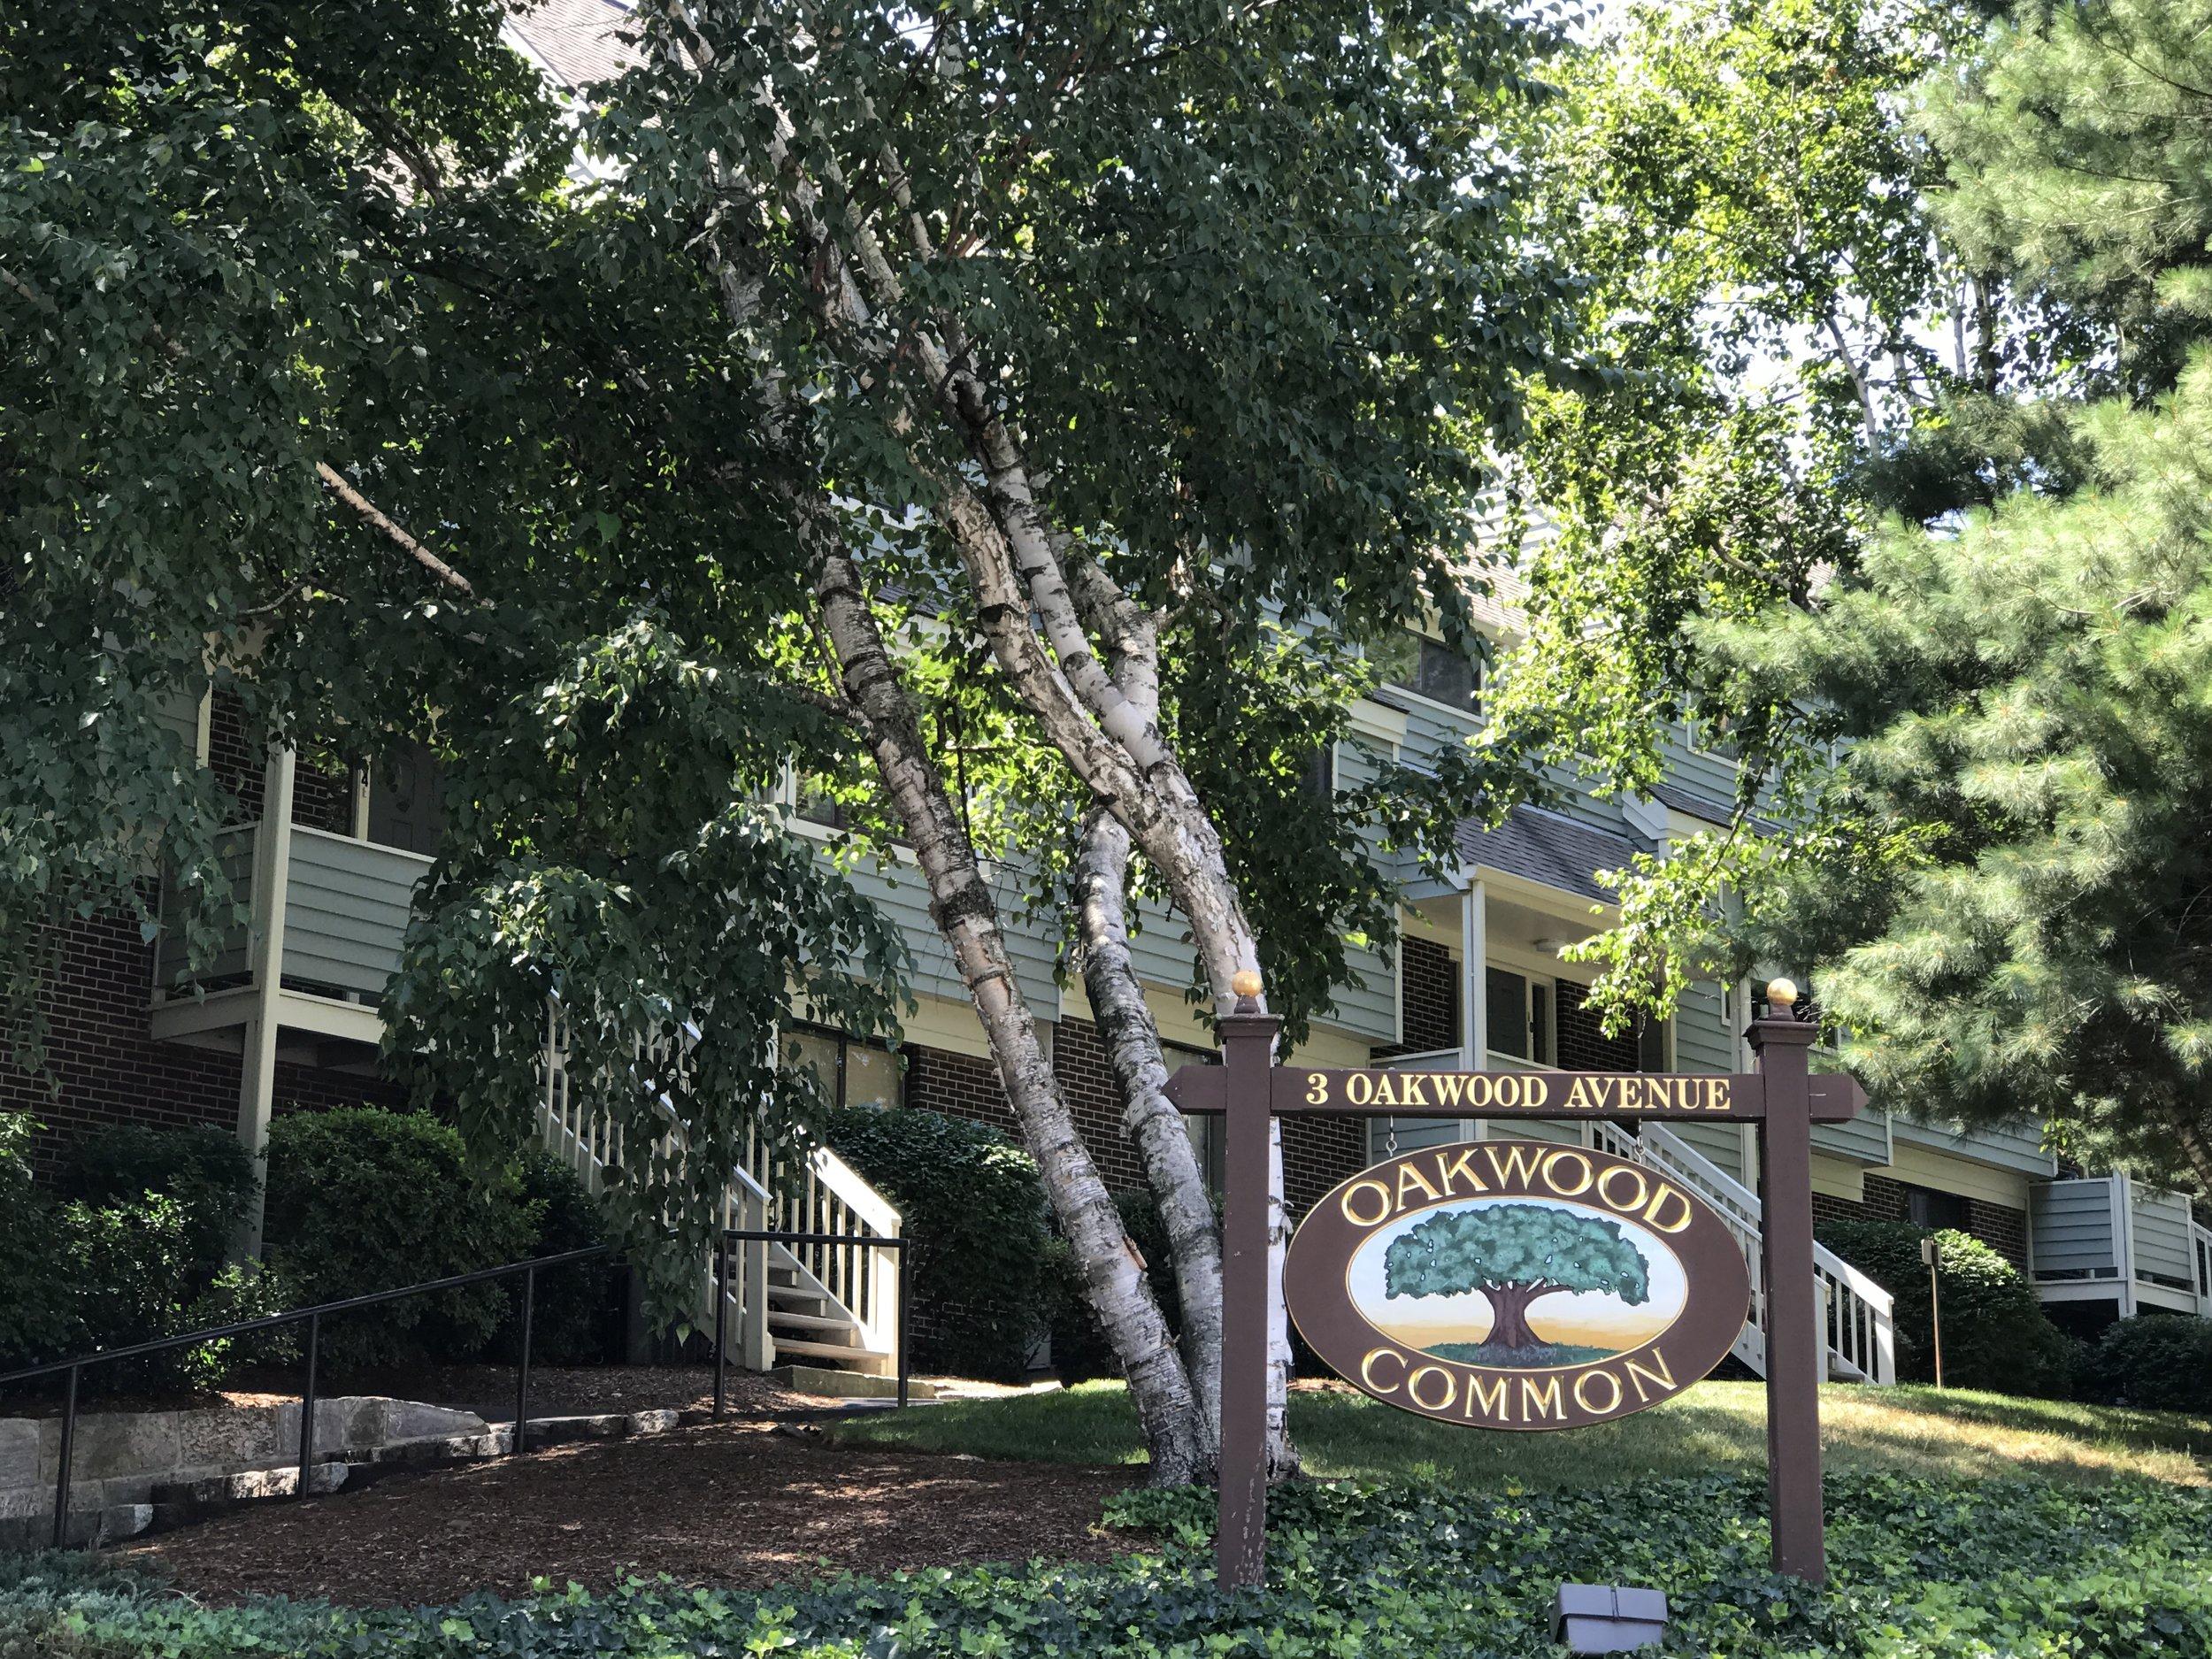 3 Oakwood Avenue, Norwalk CT  Blue Trail Realty represented the buyers of 3 Oakwood Avenue in Norwalk.